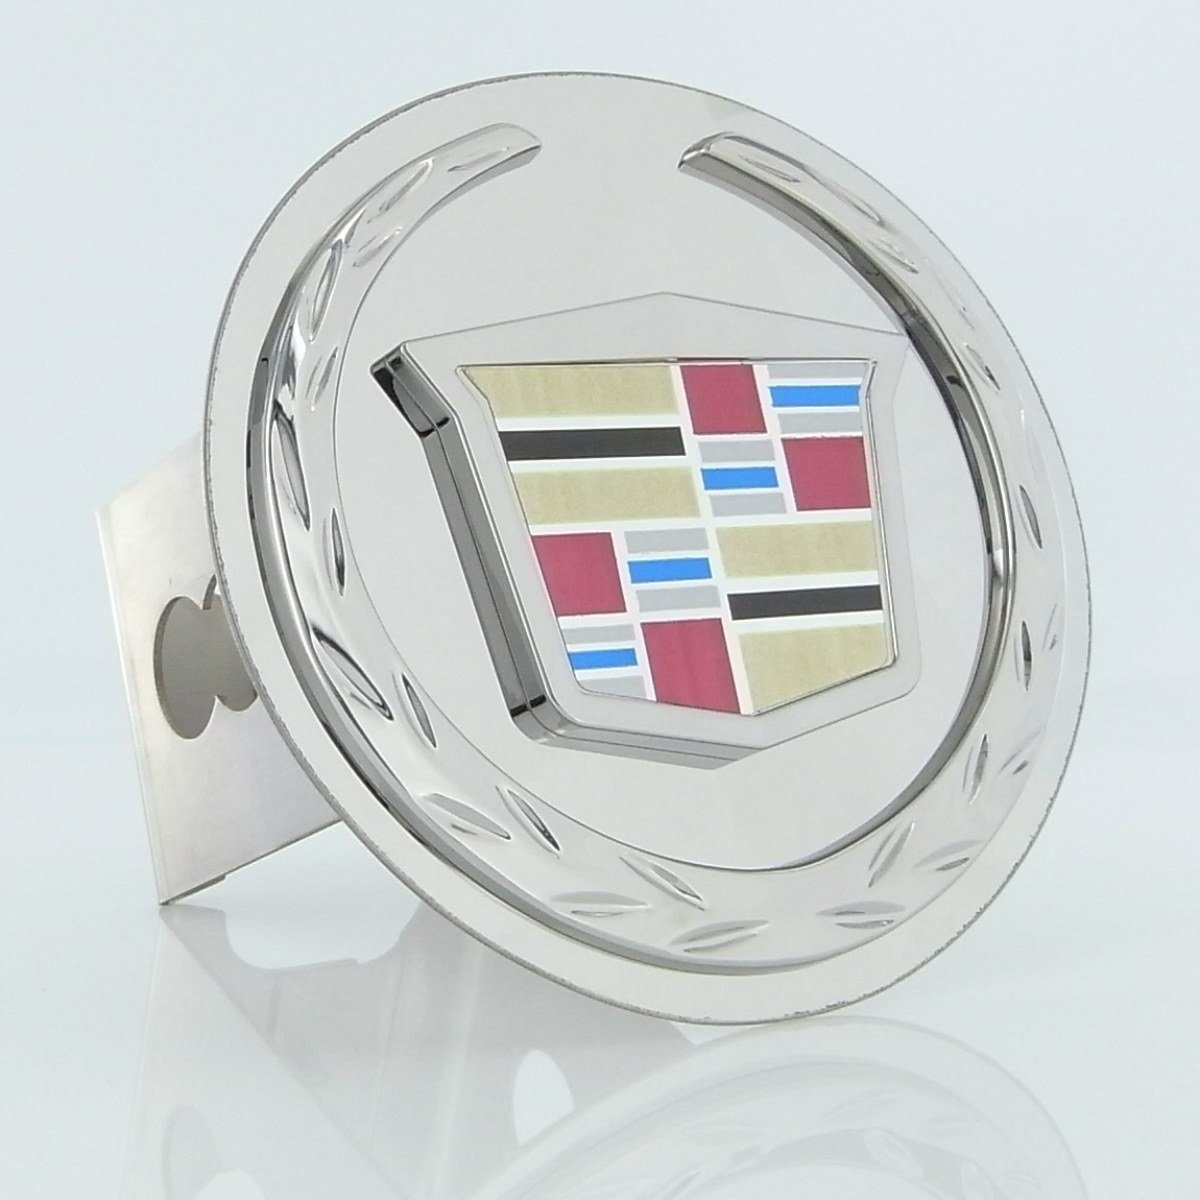 Cadillac Chrome Logo Tow Hitch Cover Plug - New Logo Au-tomotive Gold T.CAD2.C